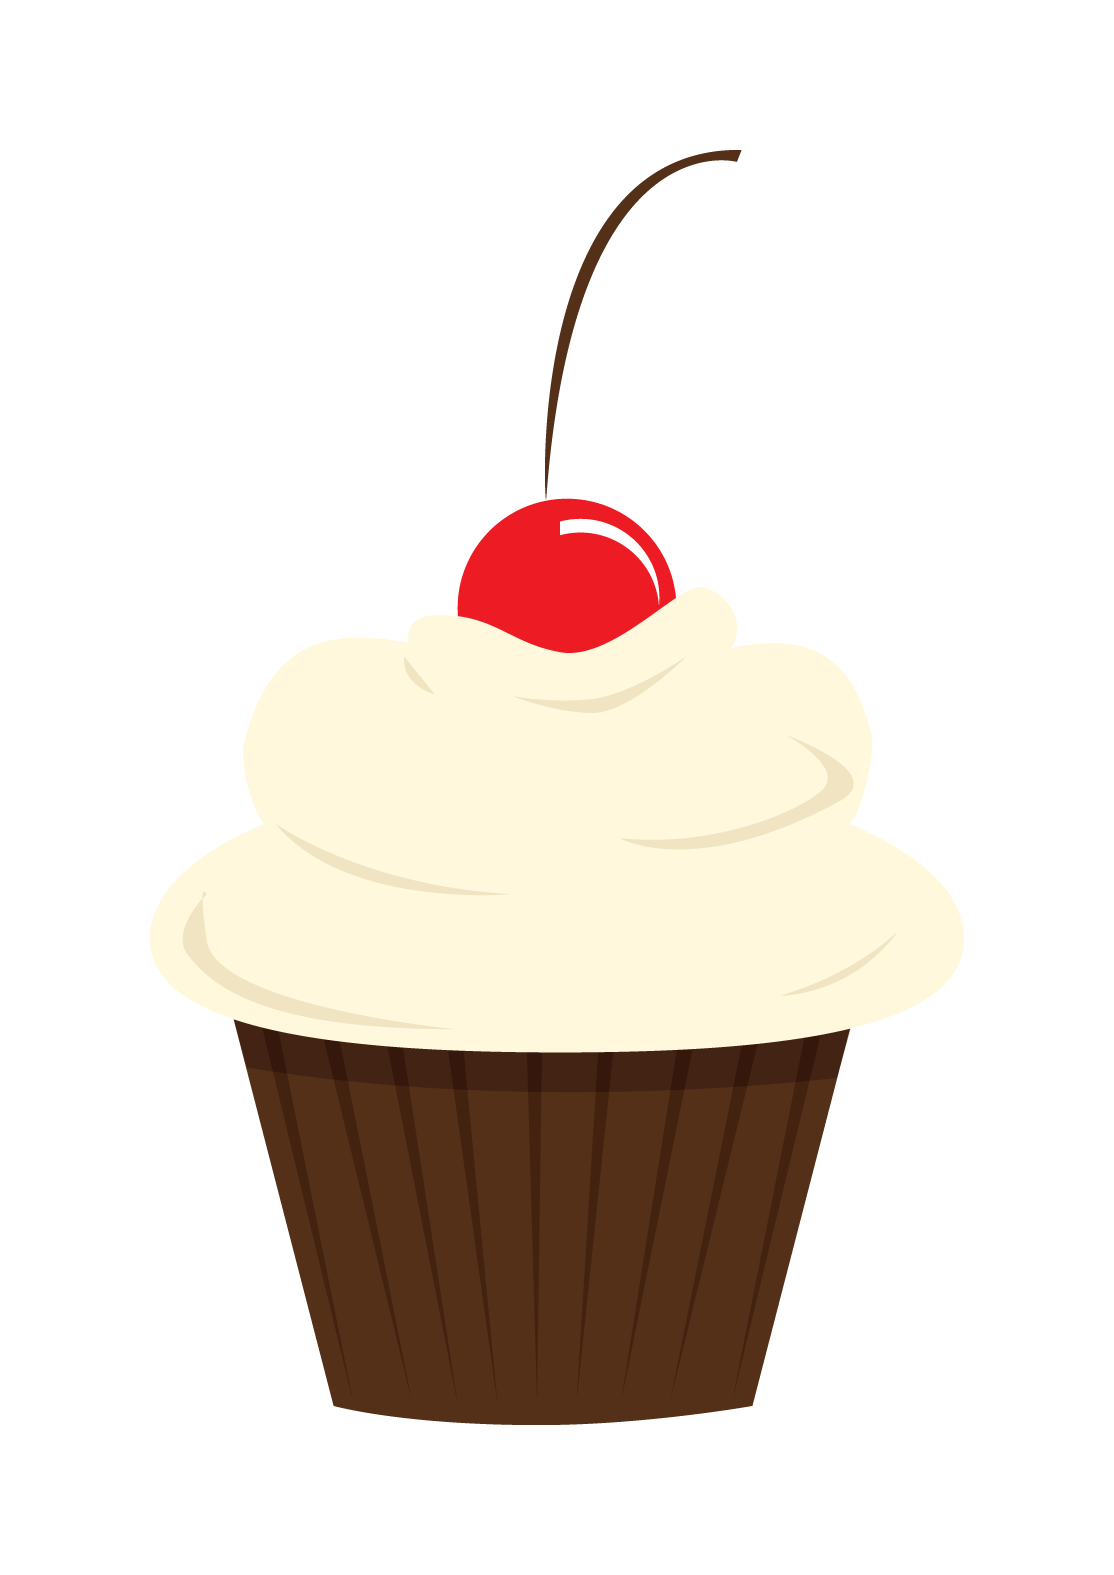 Cupcake Design Png : Party Box Design: April 2011